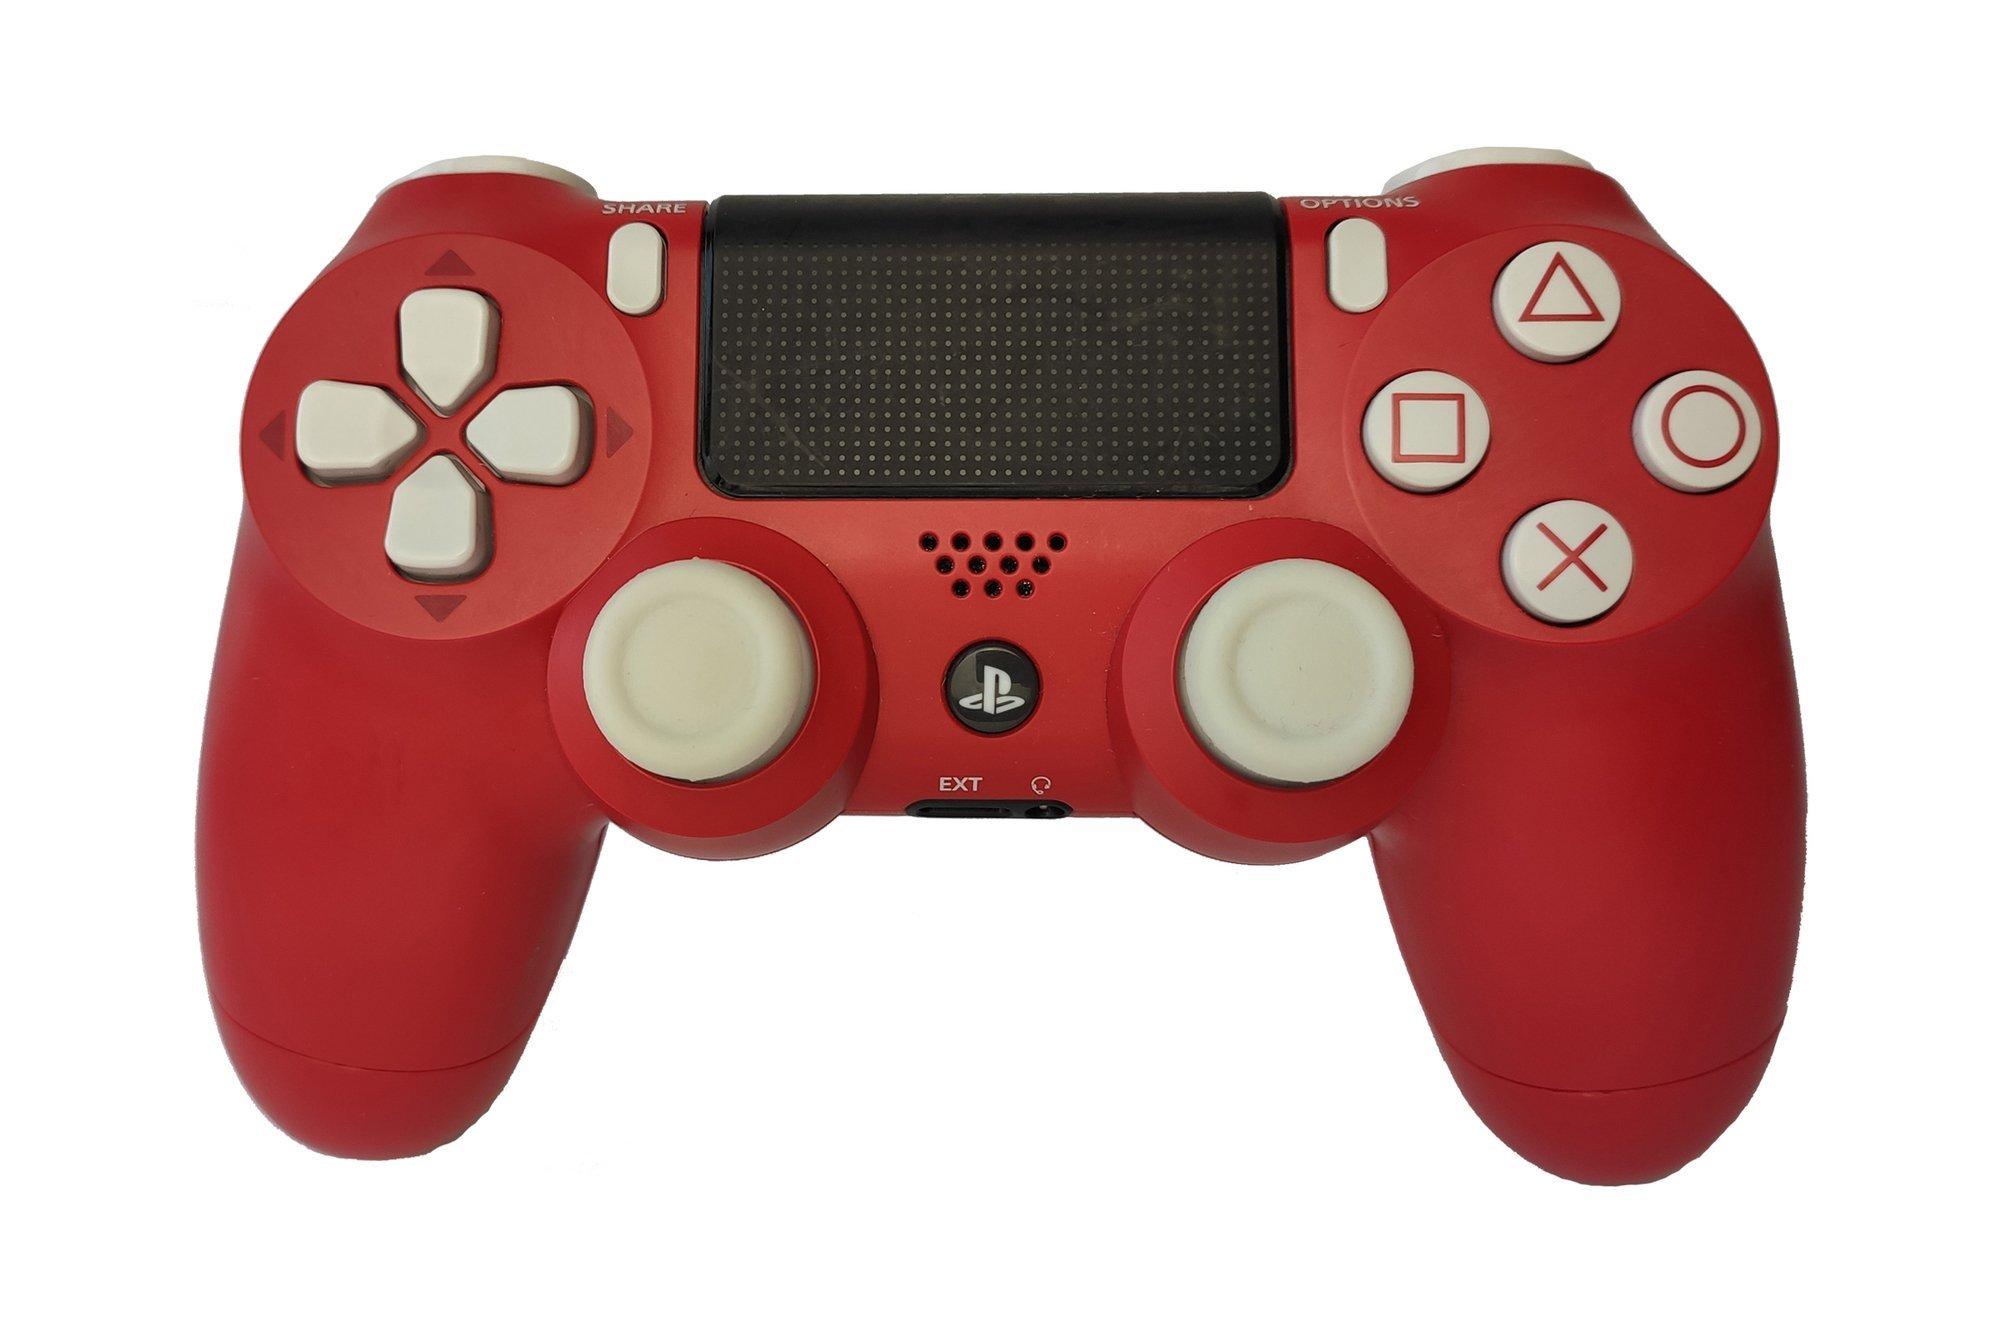 Controller Gamepad Playstation 4 PS4 v2 Spiderman